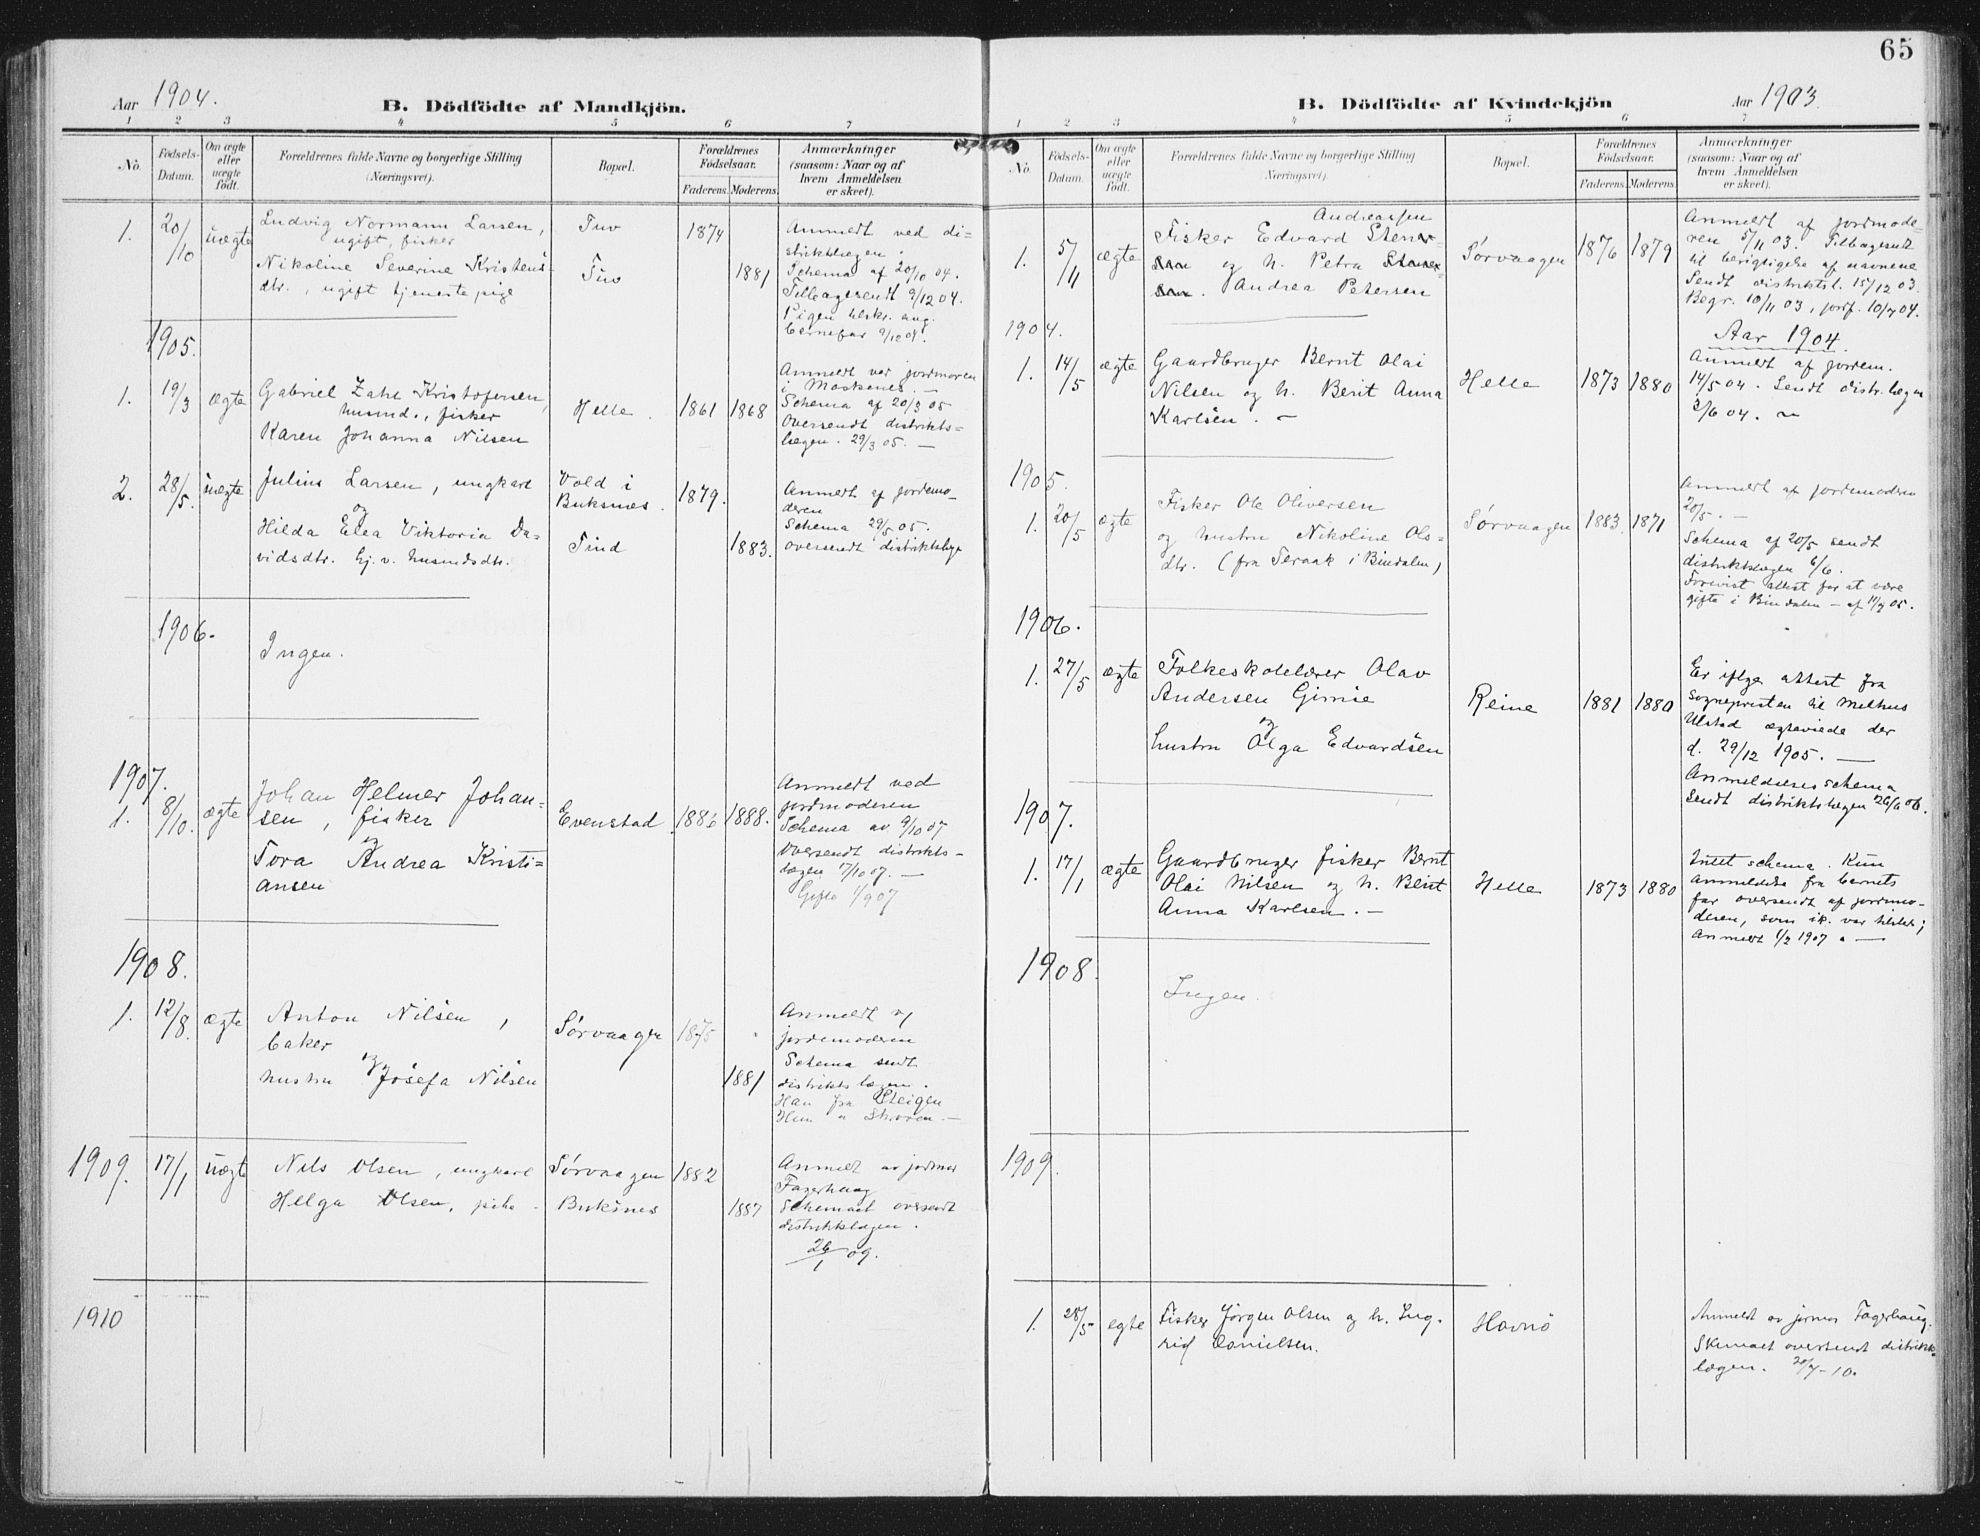 SAT, Ministerialprotokoller, klokkerbøker og fødselsregistre - Nordland, 886/L1221: Ministerialbok nr. 886A03, 1903-1913, s. 65